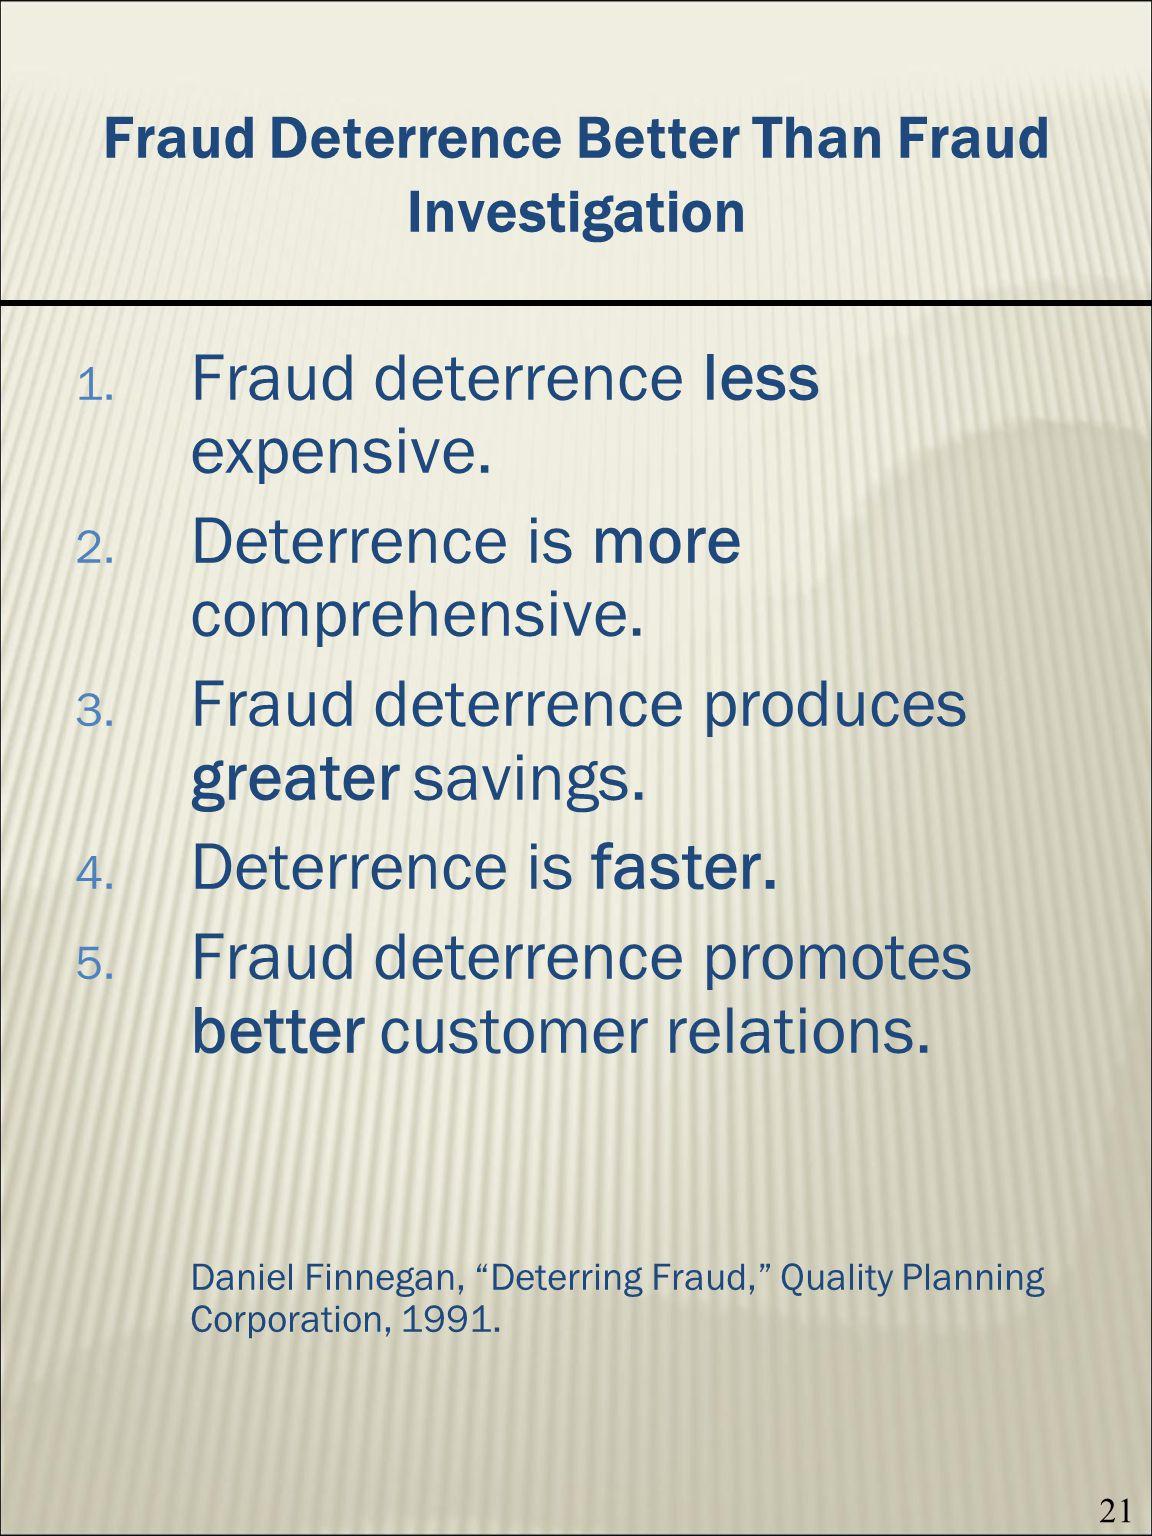 Fraud Deterrence Better Than Fraud Investigation